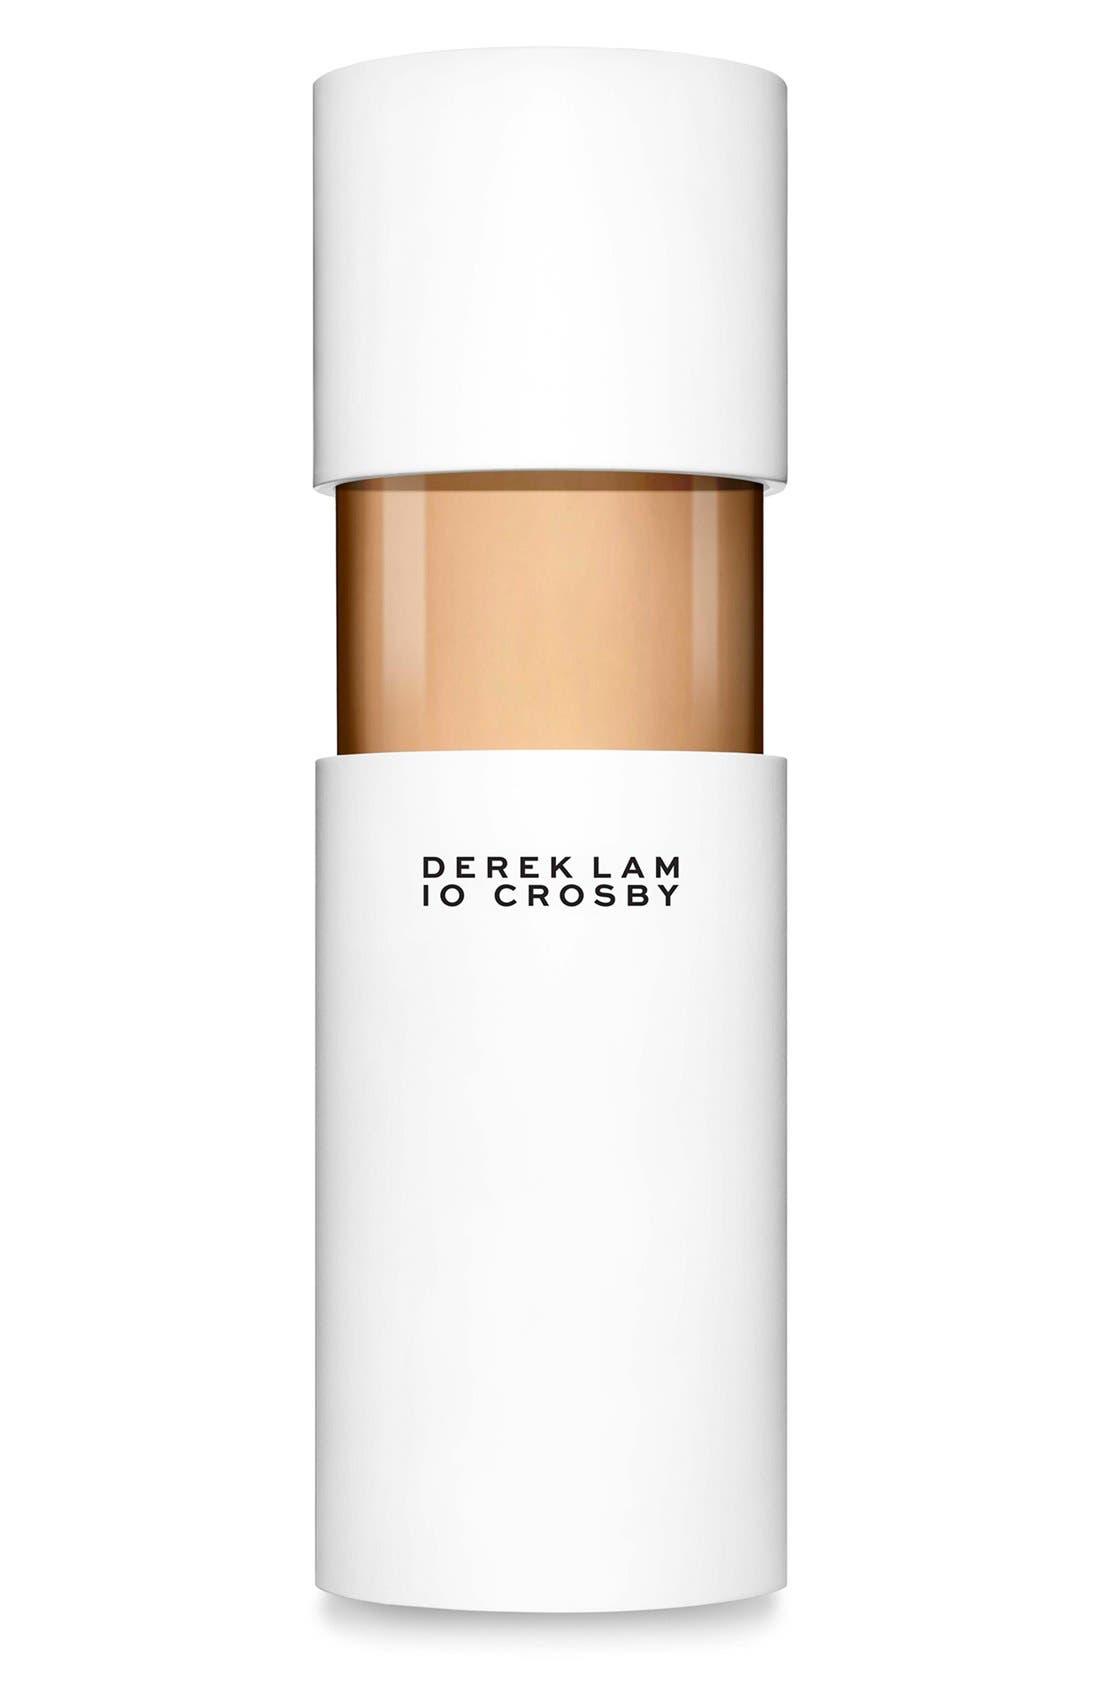 Derek Lam 10 Crosby 'Looking Glass' Eau de Parfum